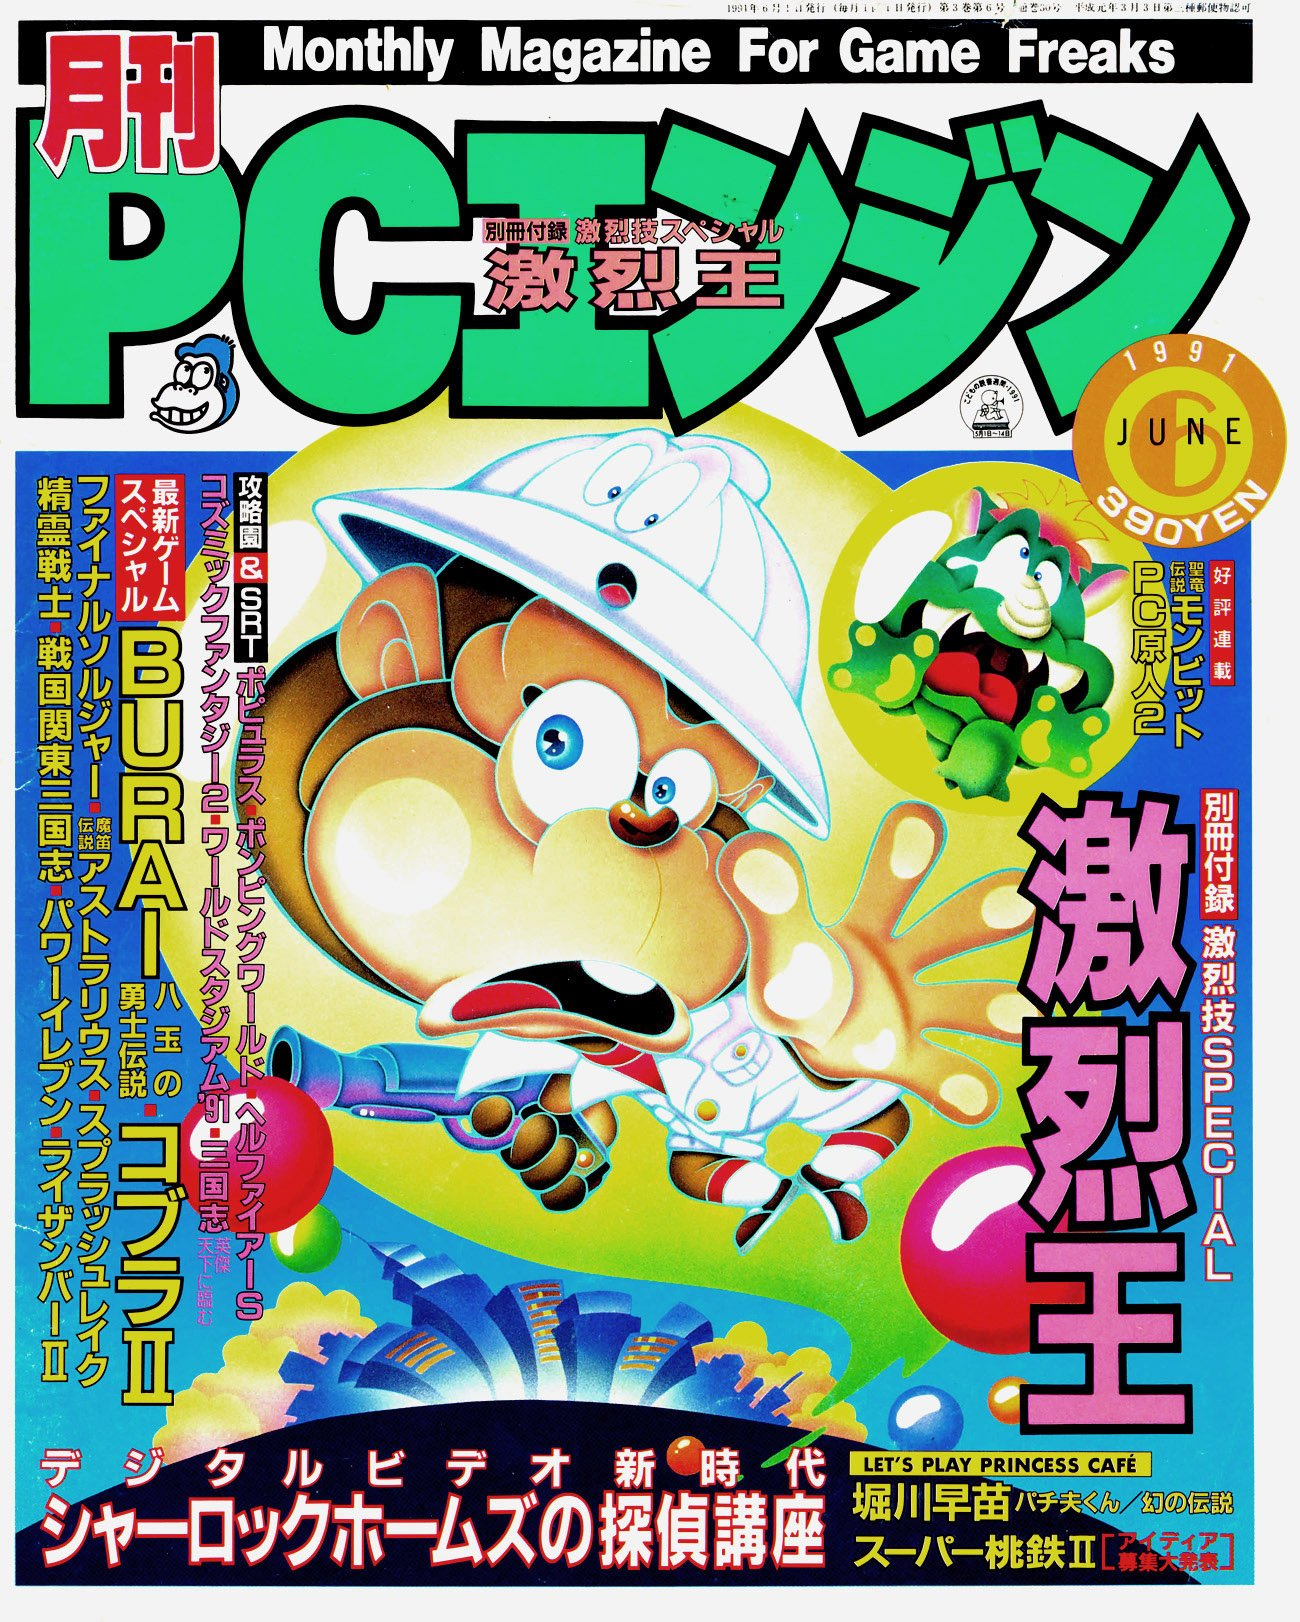 Gekkan PC Engine Issue 30 (June 1991)